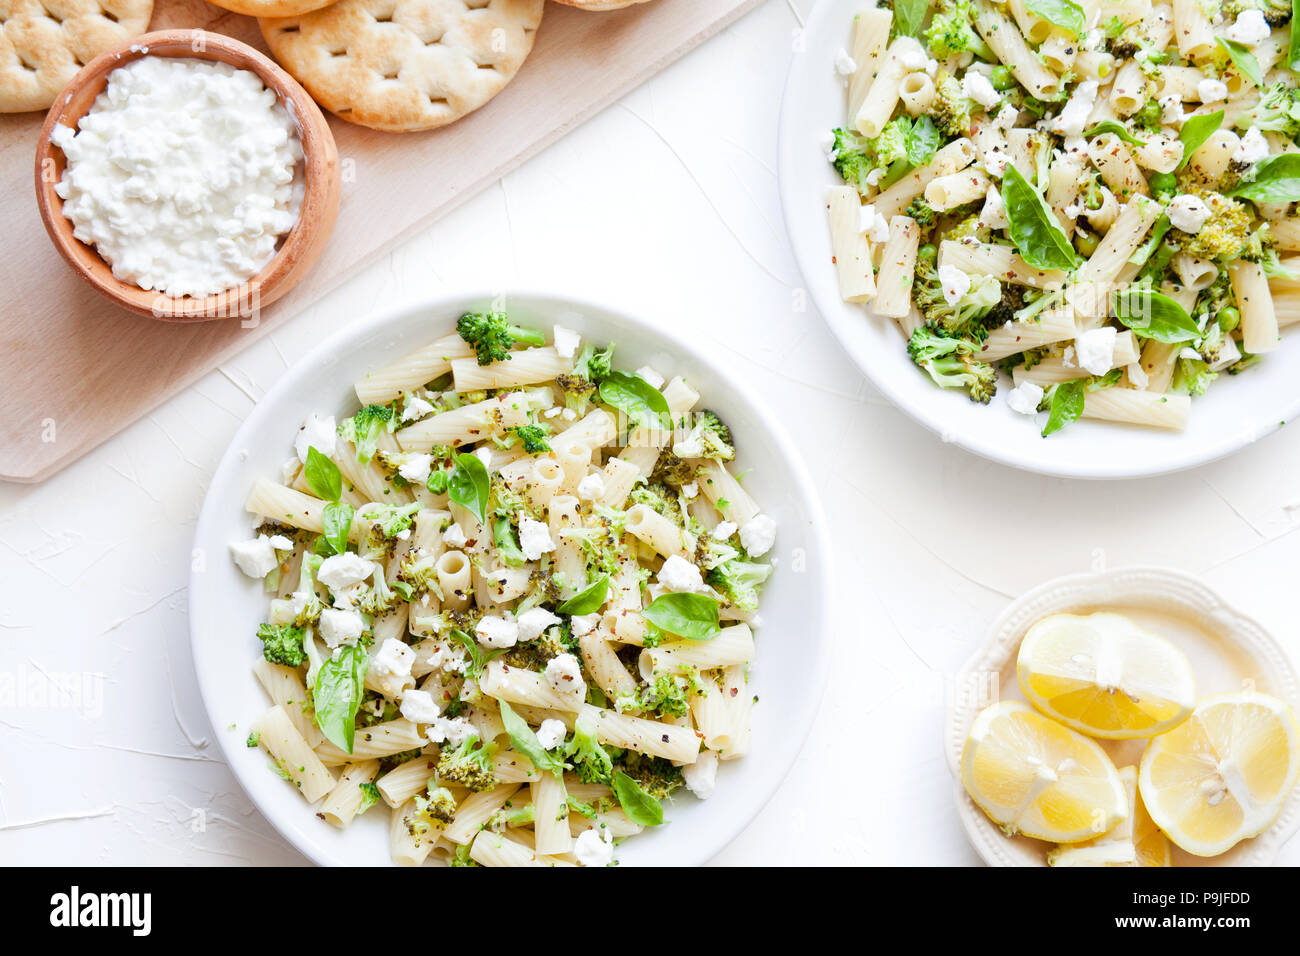 Deux bols de pâtes avec des légumes bio Photo Stock